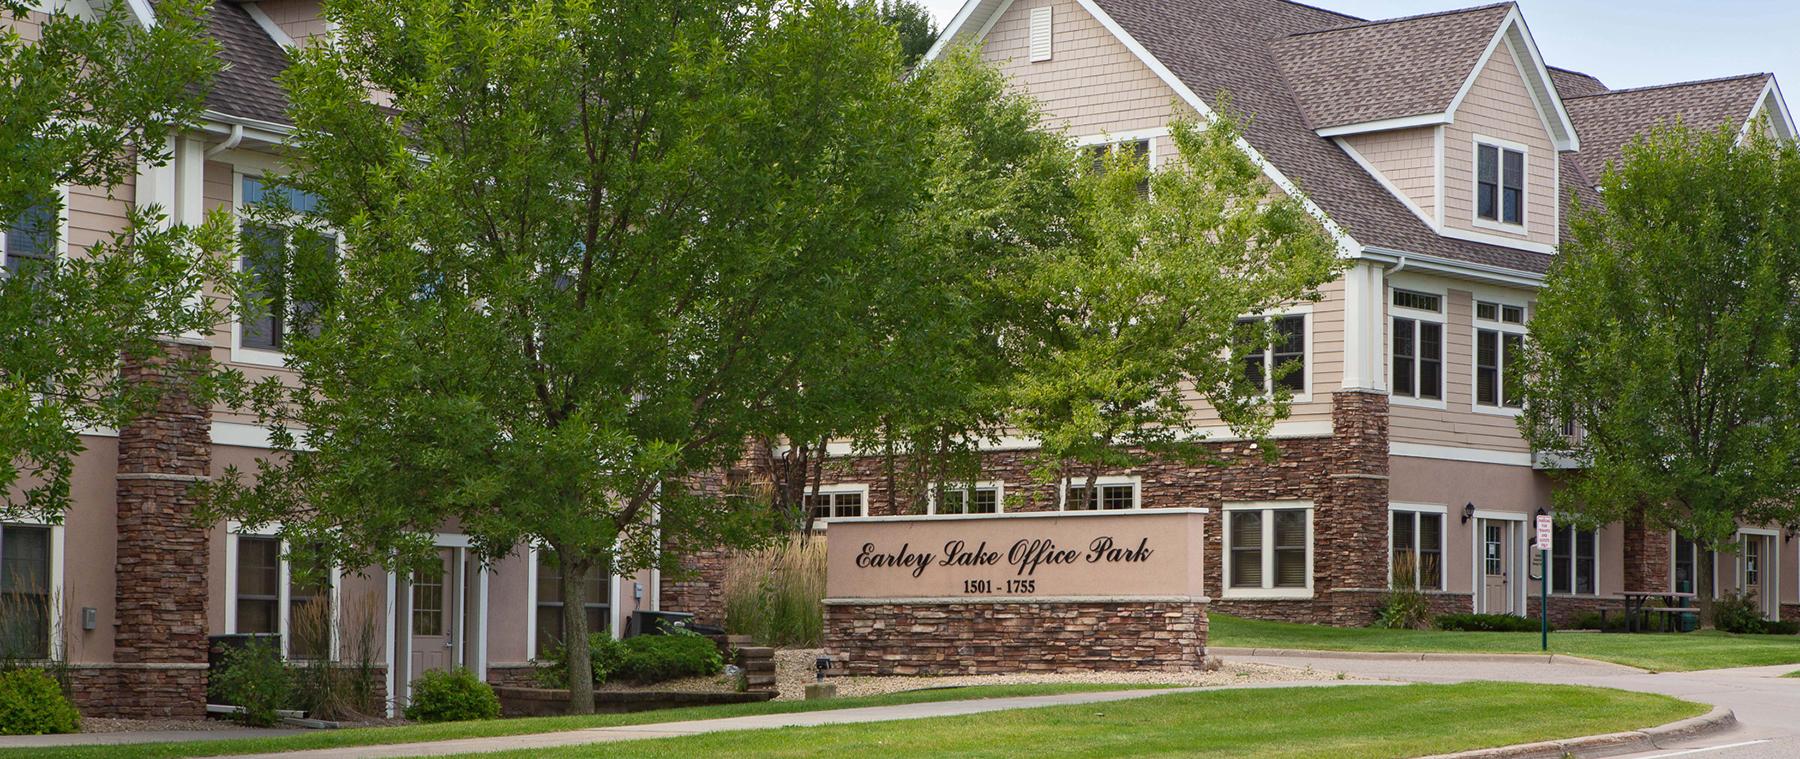 Earley Lake Office Park Burnsville MN monument view